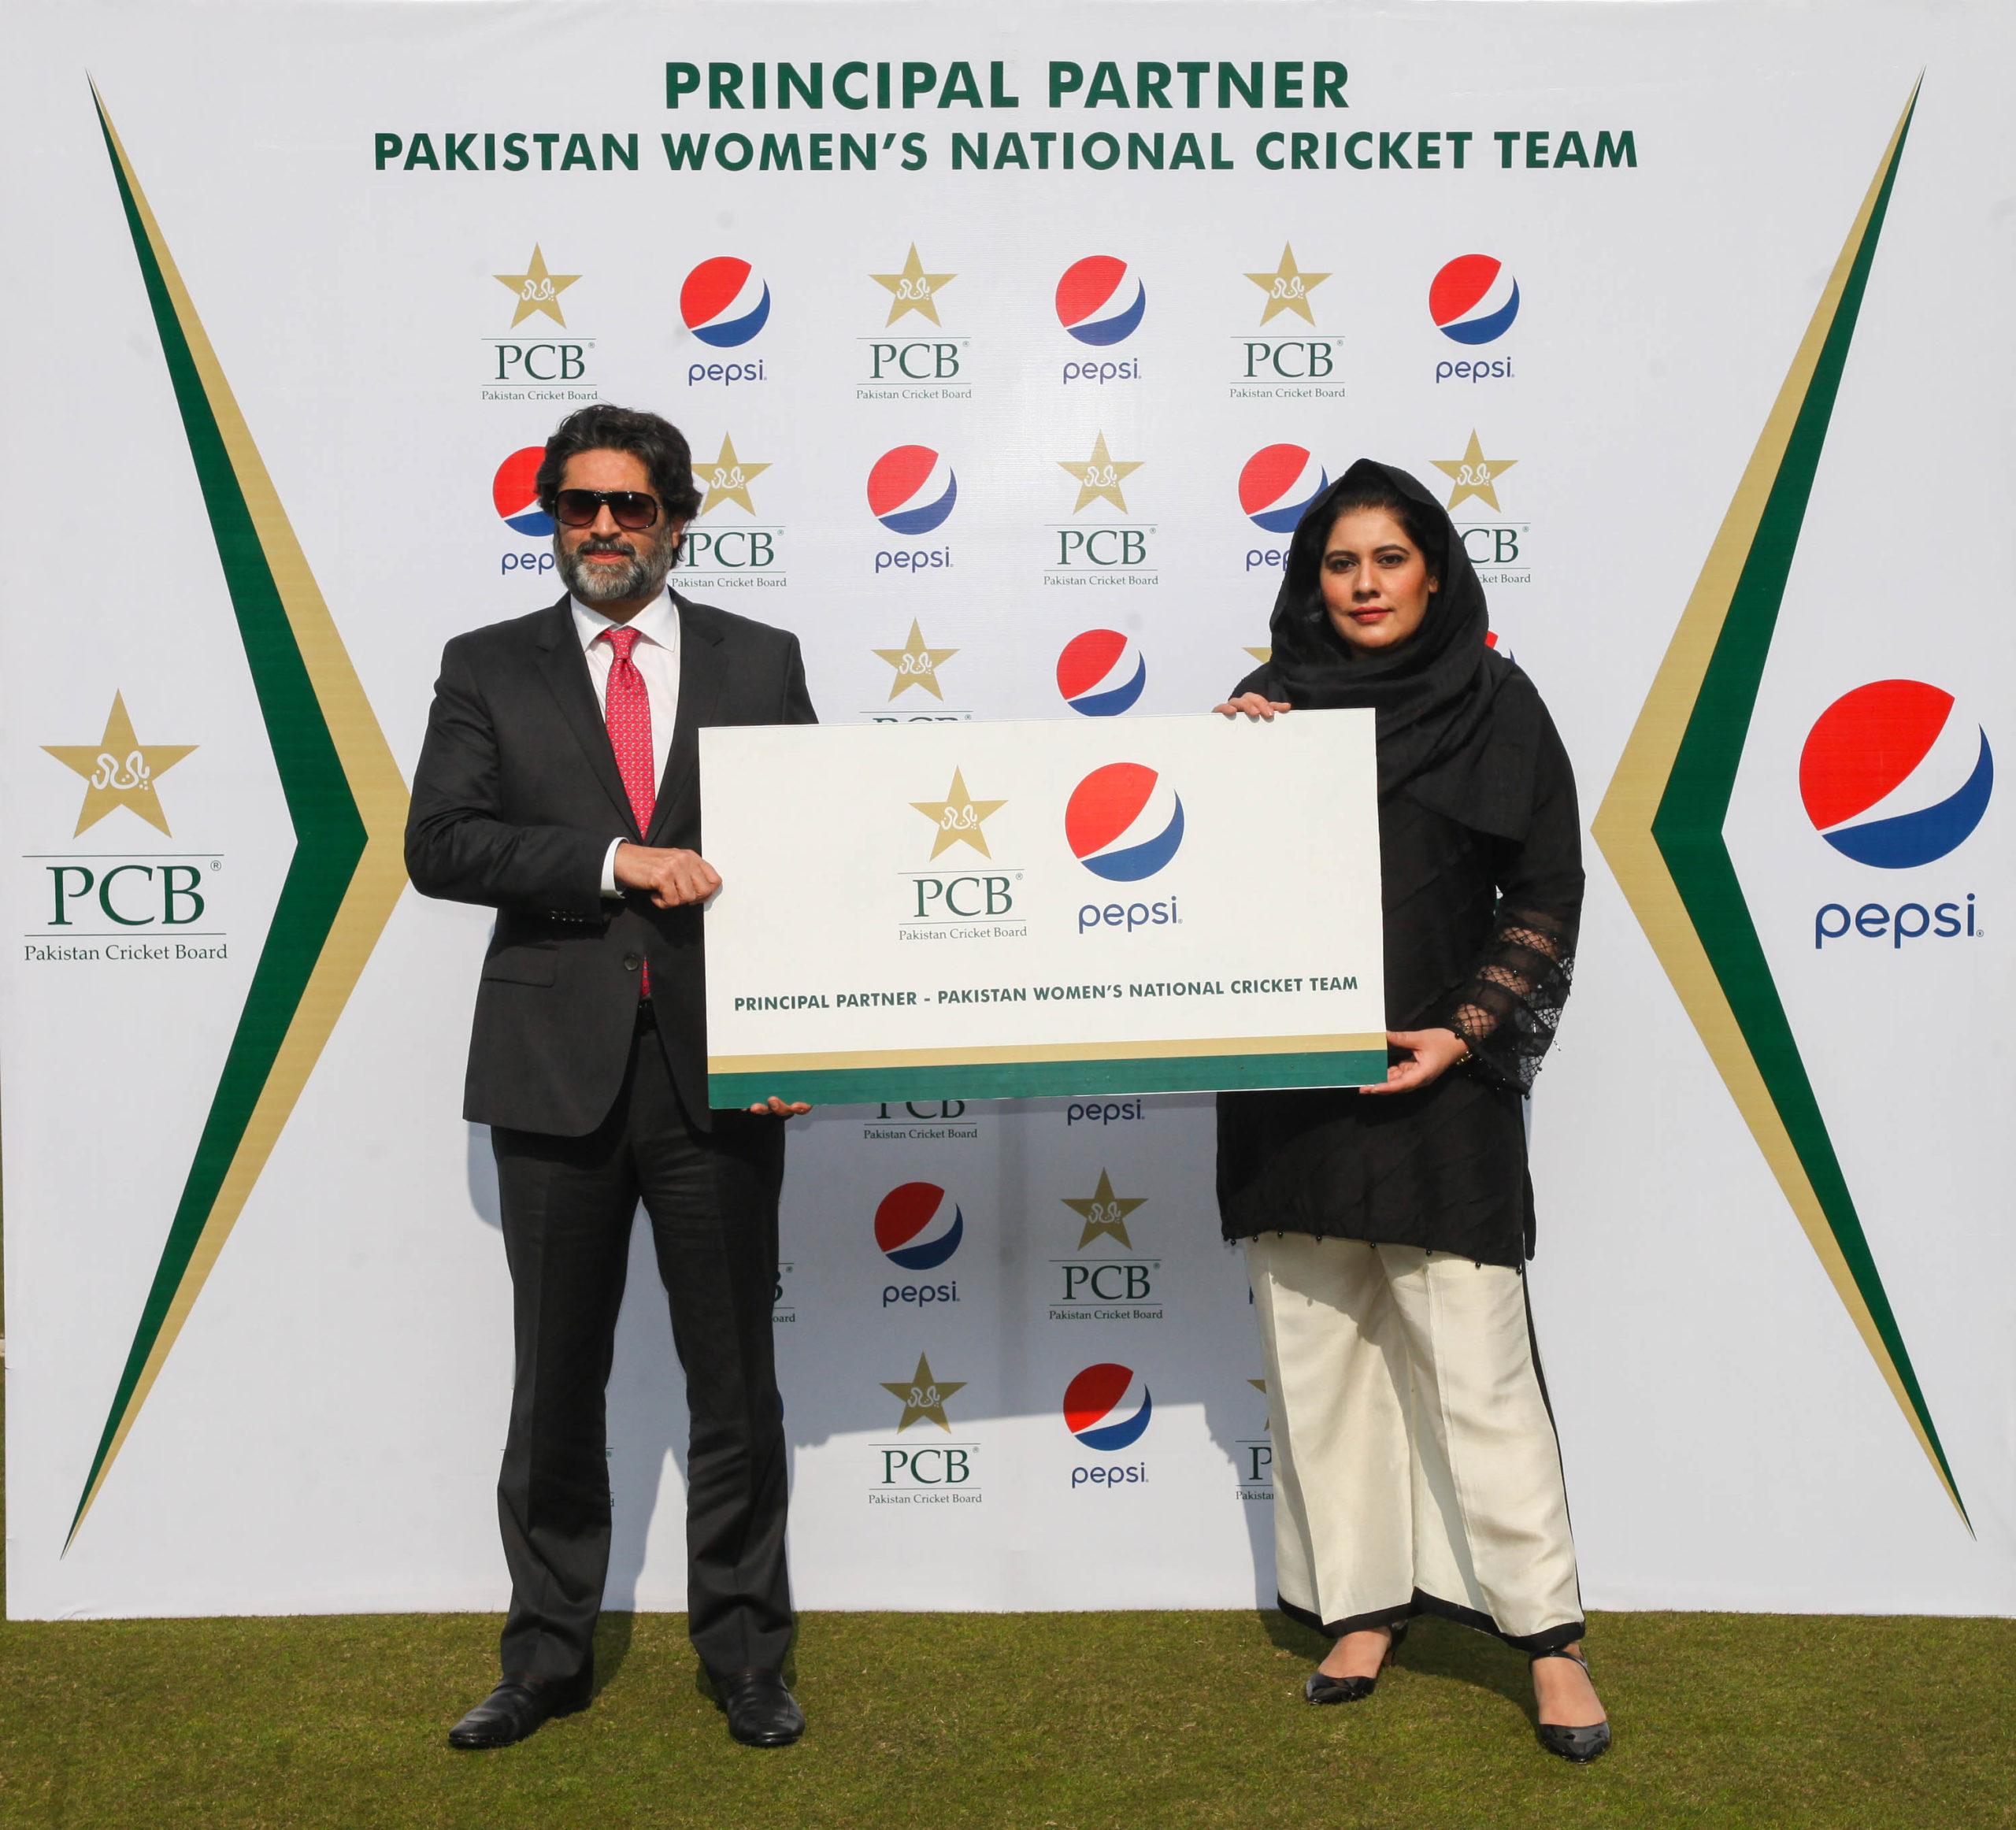 PCB: Pepsi becomes Principal Partner of Pakistan national women's cricket team